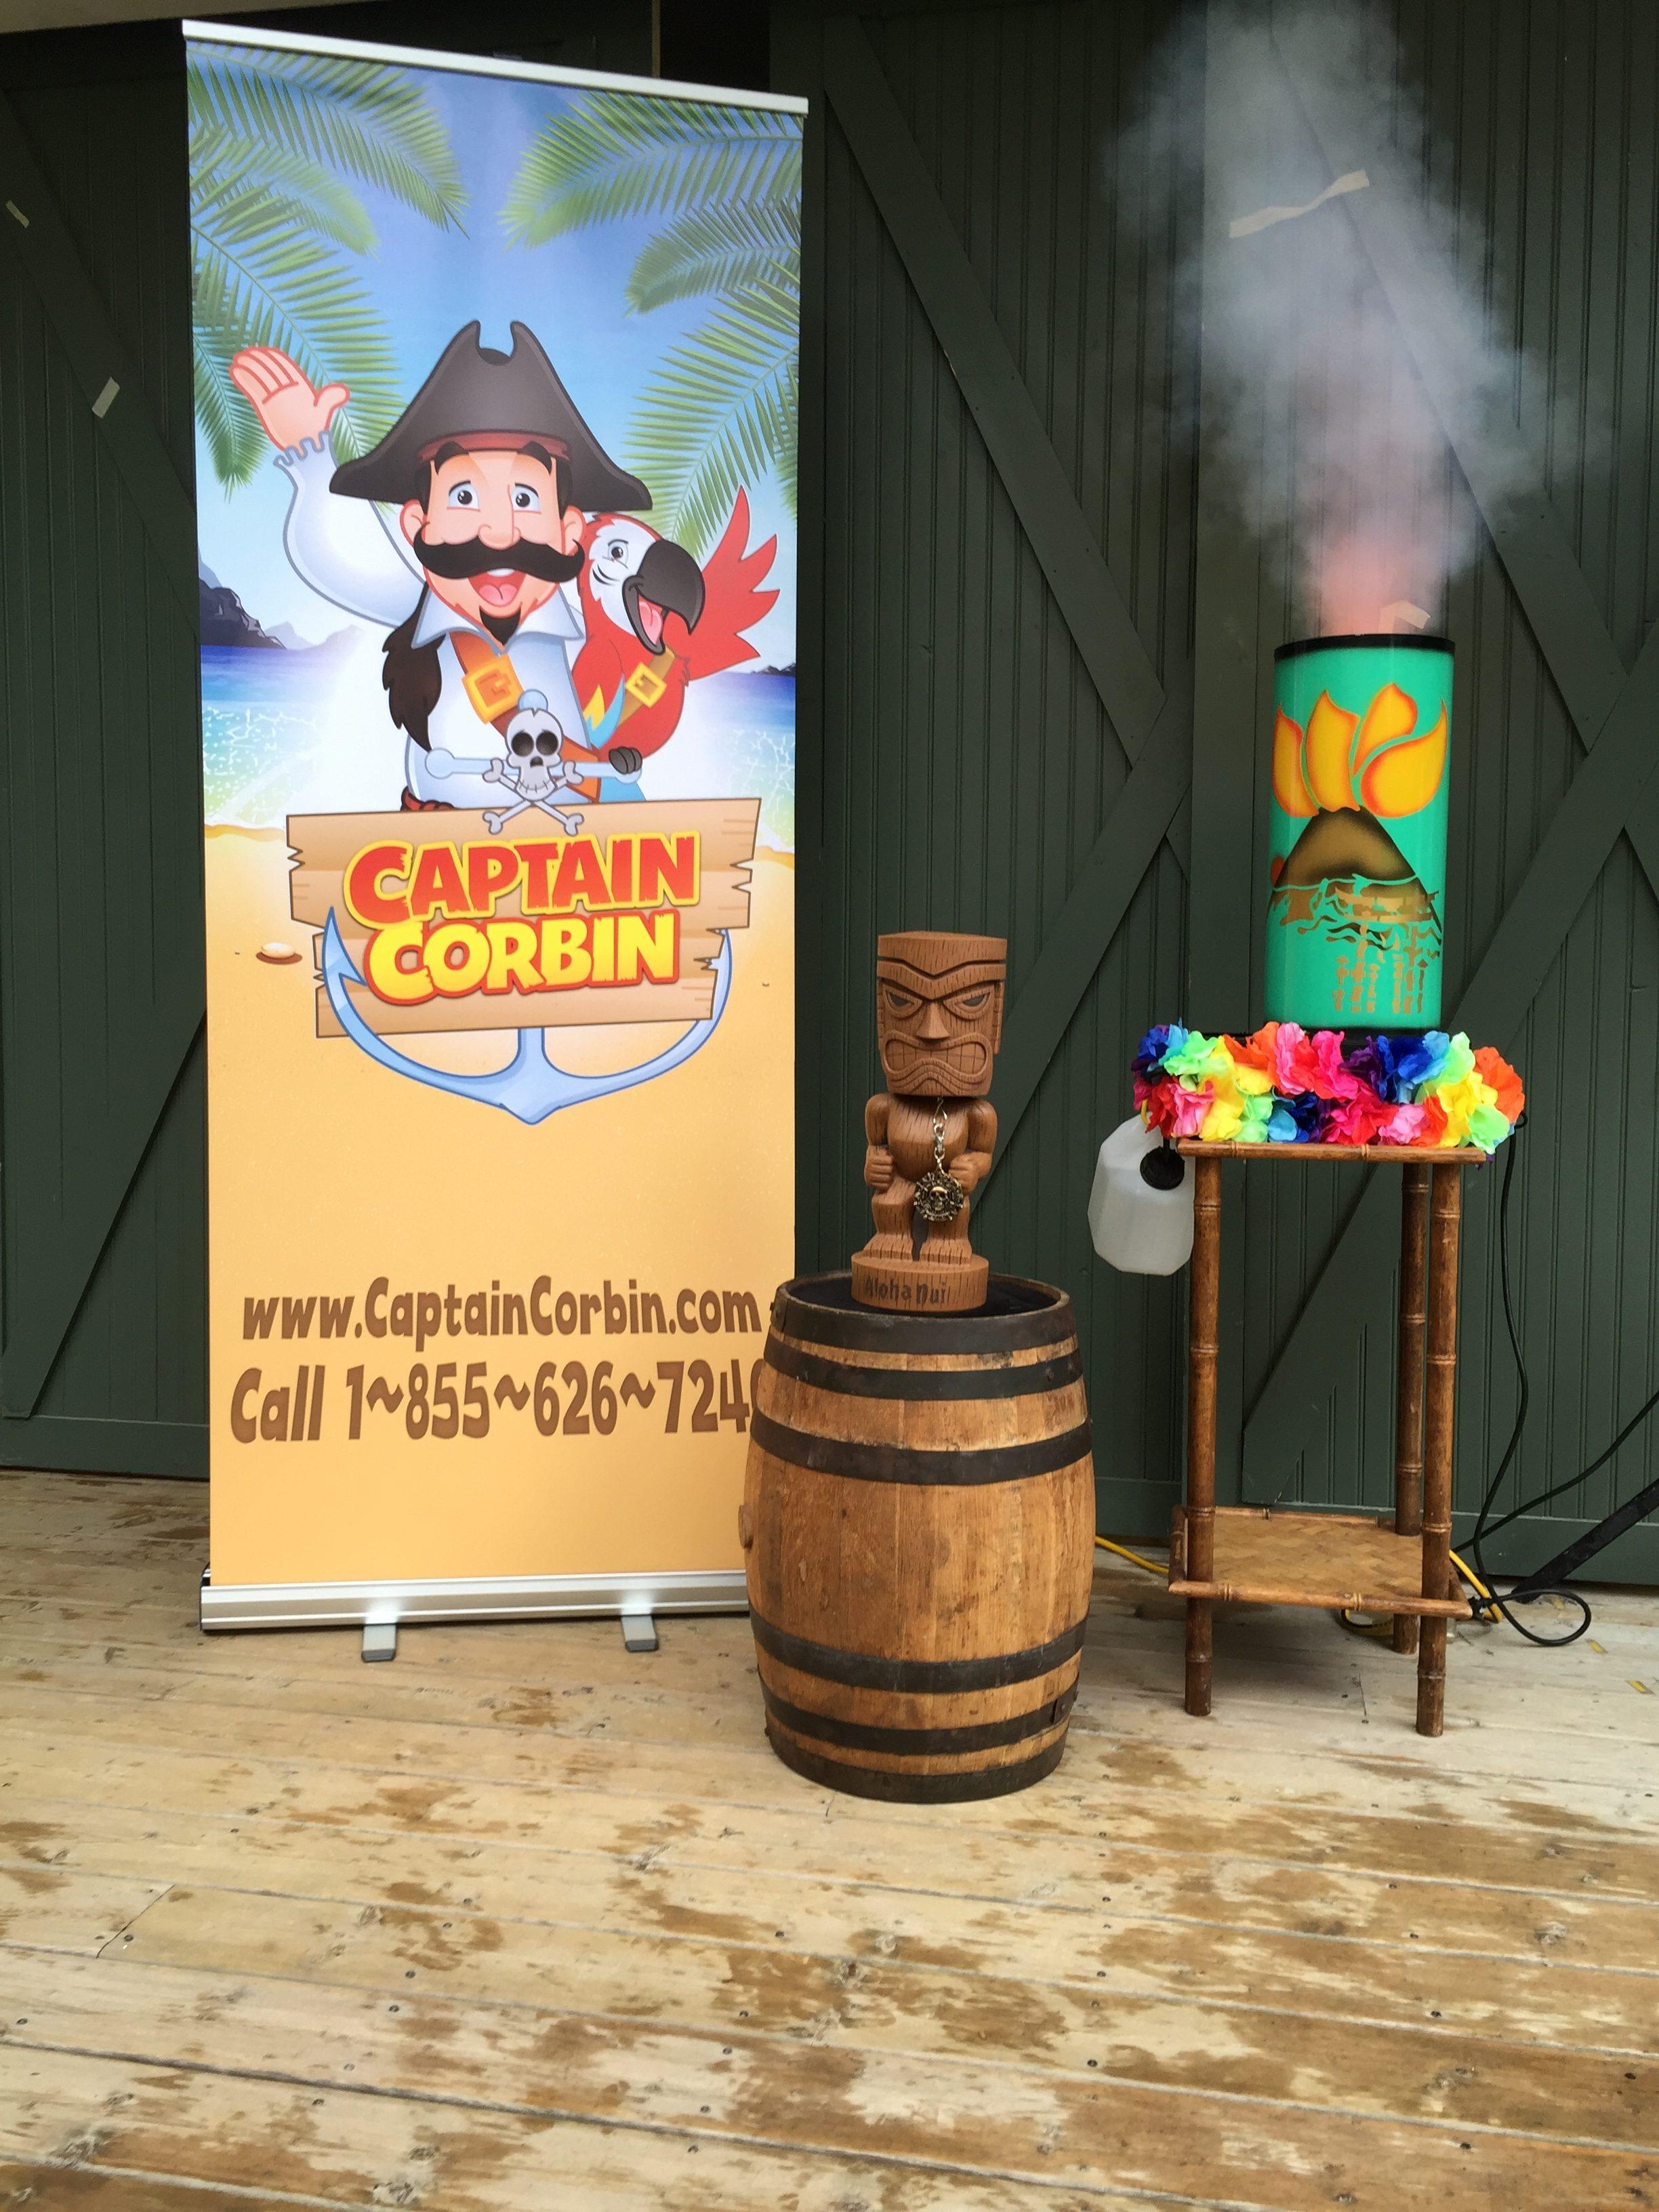 tiki, pirate, magic show, volcano